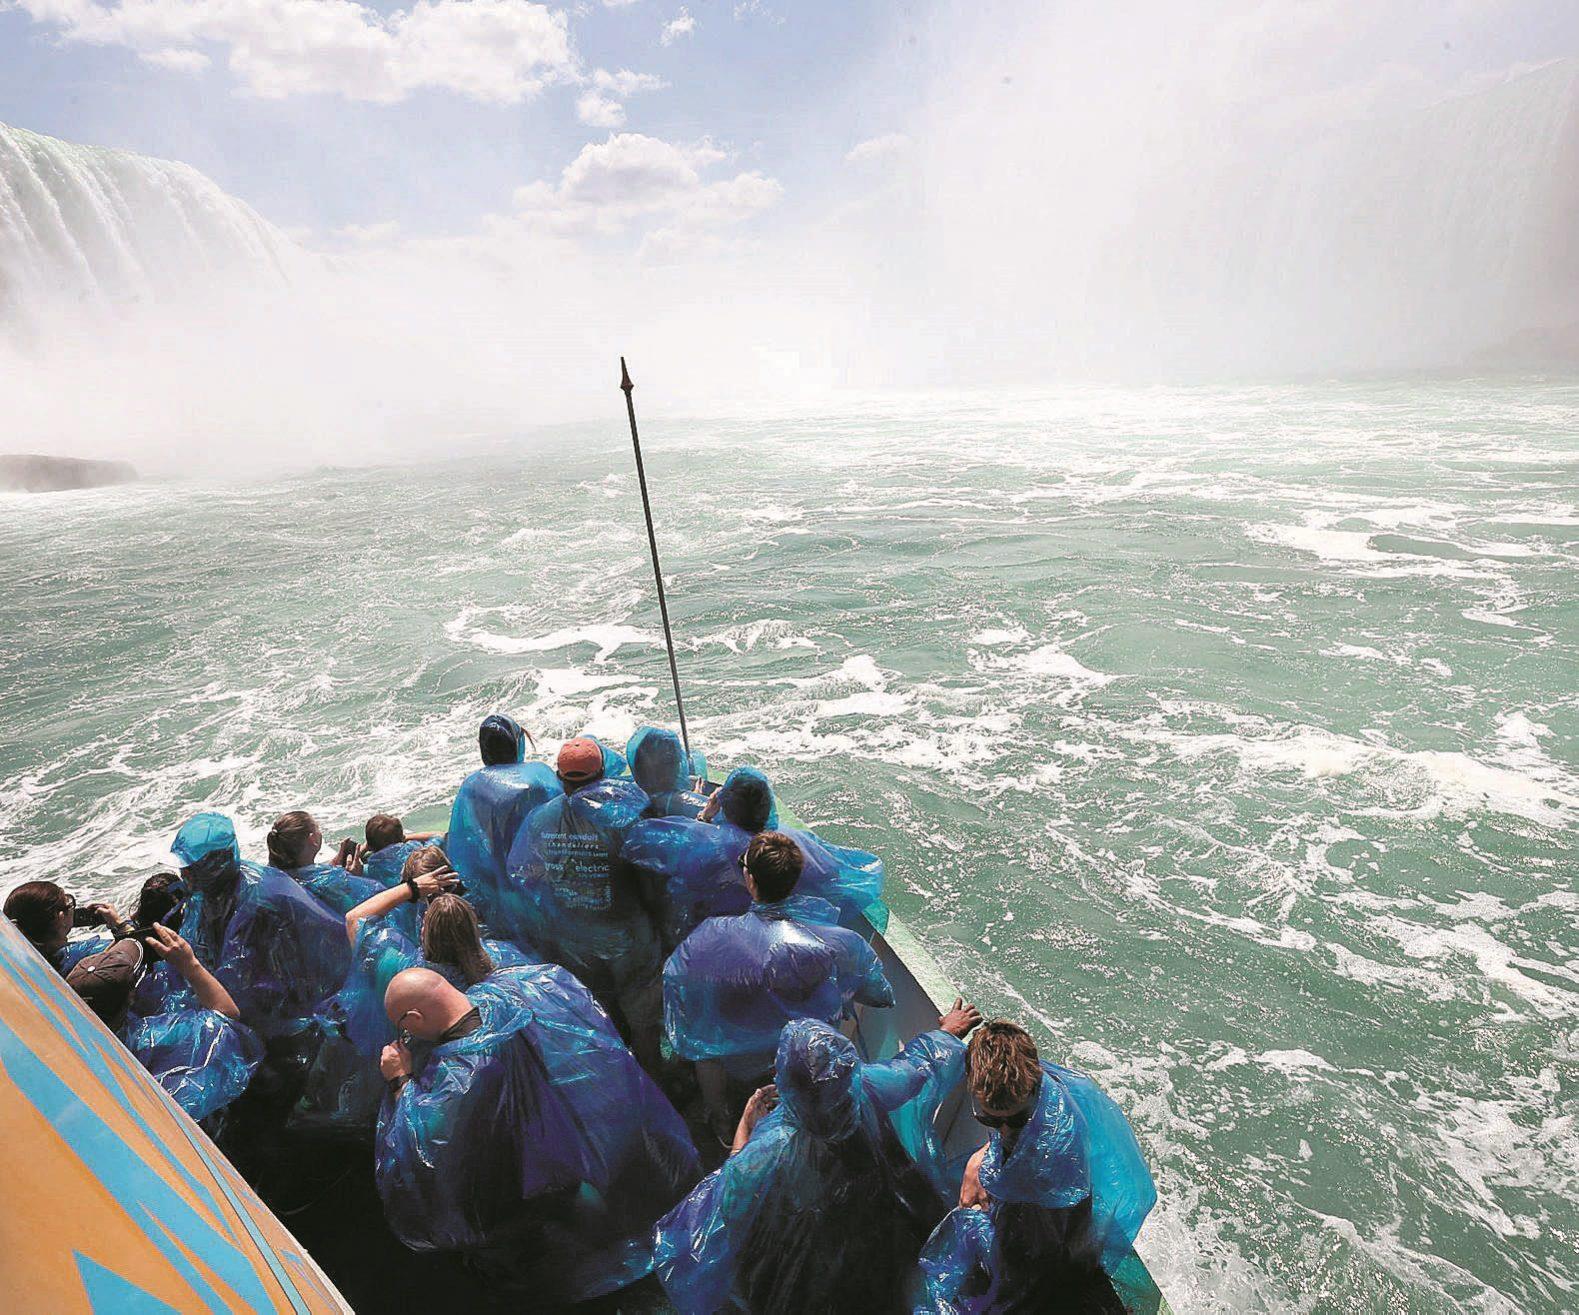 The Maid of the Mist carries sightseers towards the base of Niagara Falls.  (File photo/Sharon Cantillon/Buffalo News)